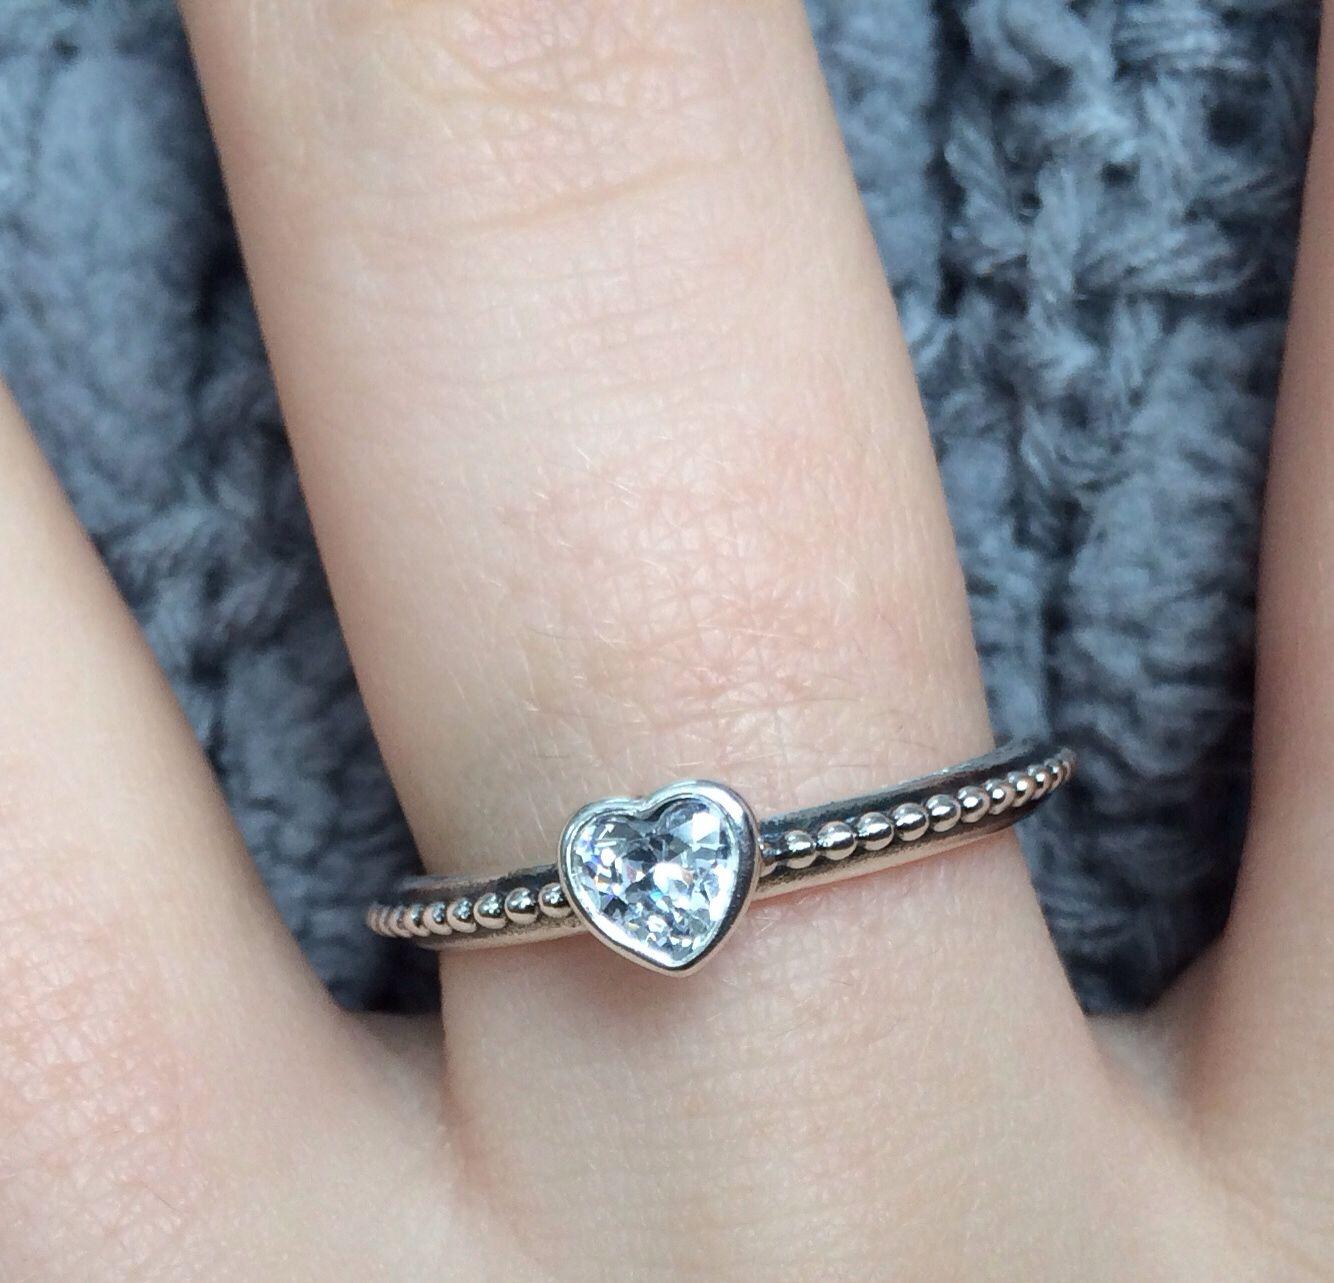 Pandora Jewelry Meaning: Cutest Little Pandora Ring